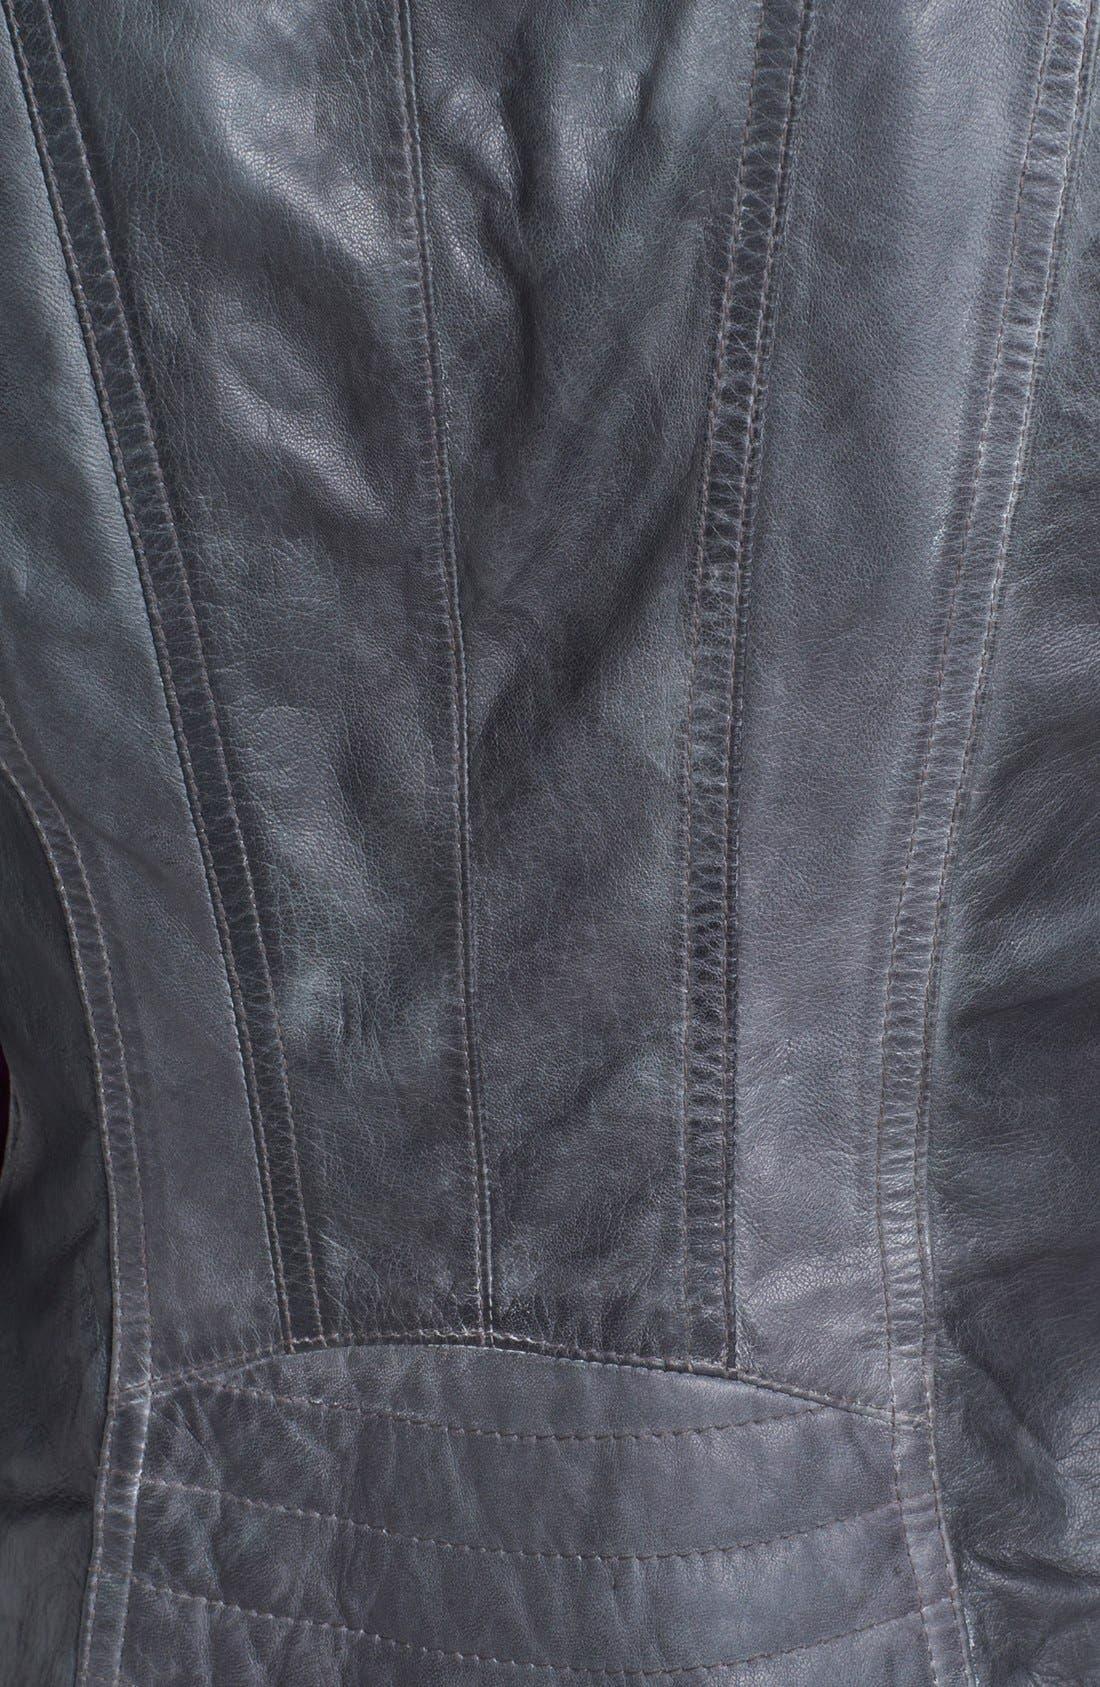 Asymmetrical Leather Moto Jacket,                             Alternate thumbnail 4, color,                             020